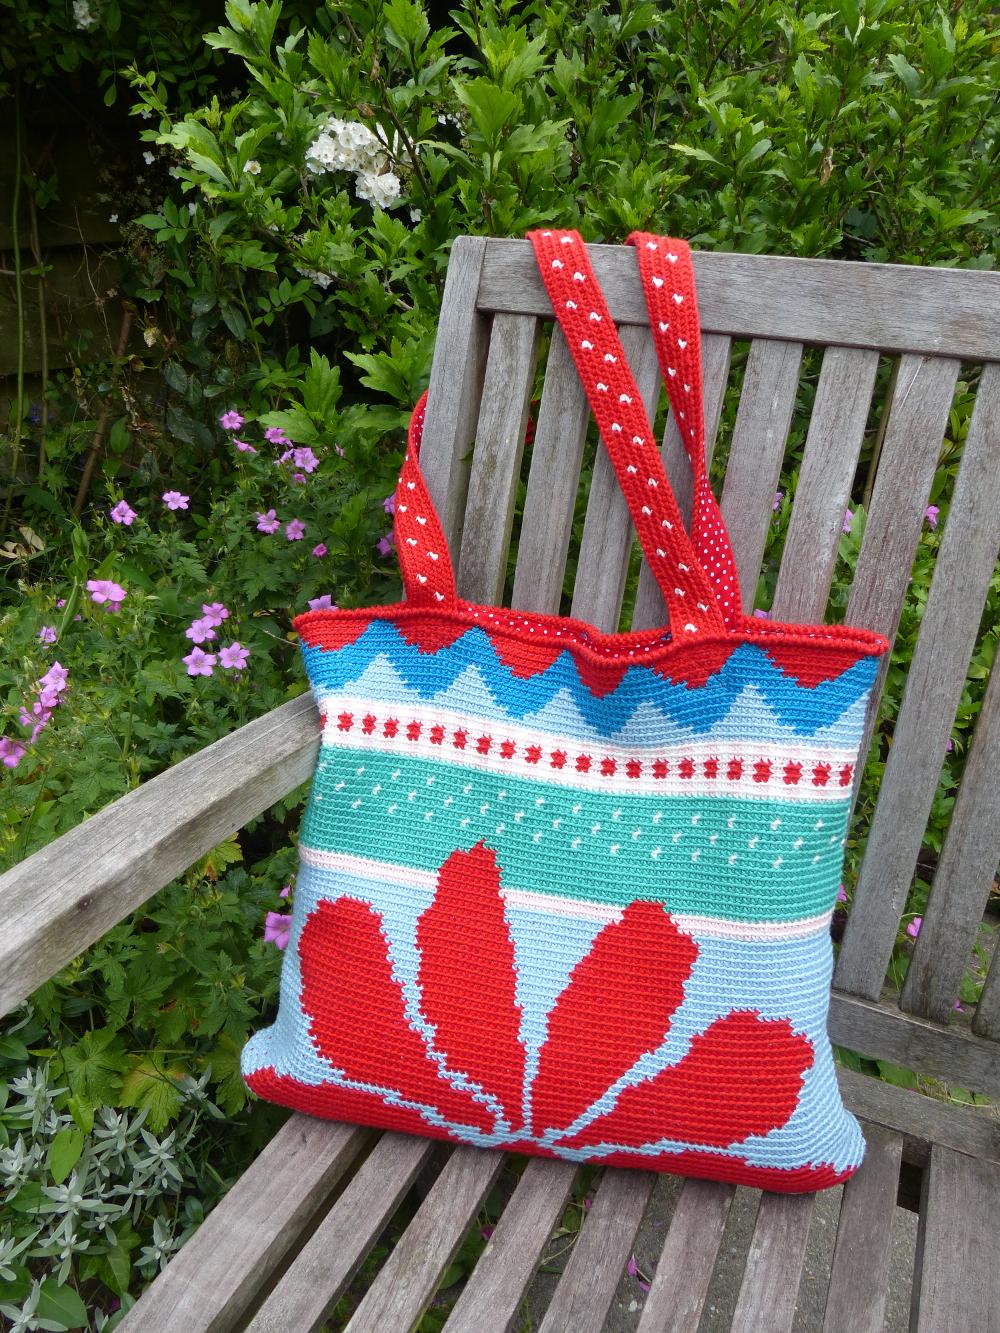 Madebyleen Blog Over Haken Crochet Blog Juli 2015